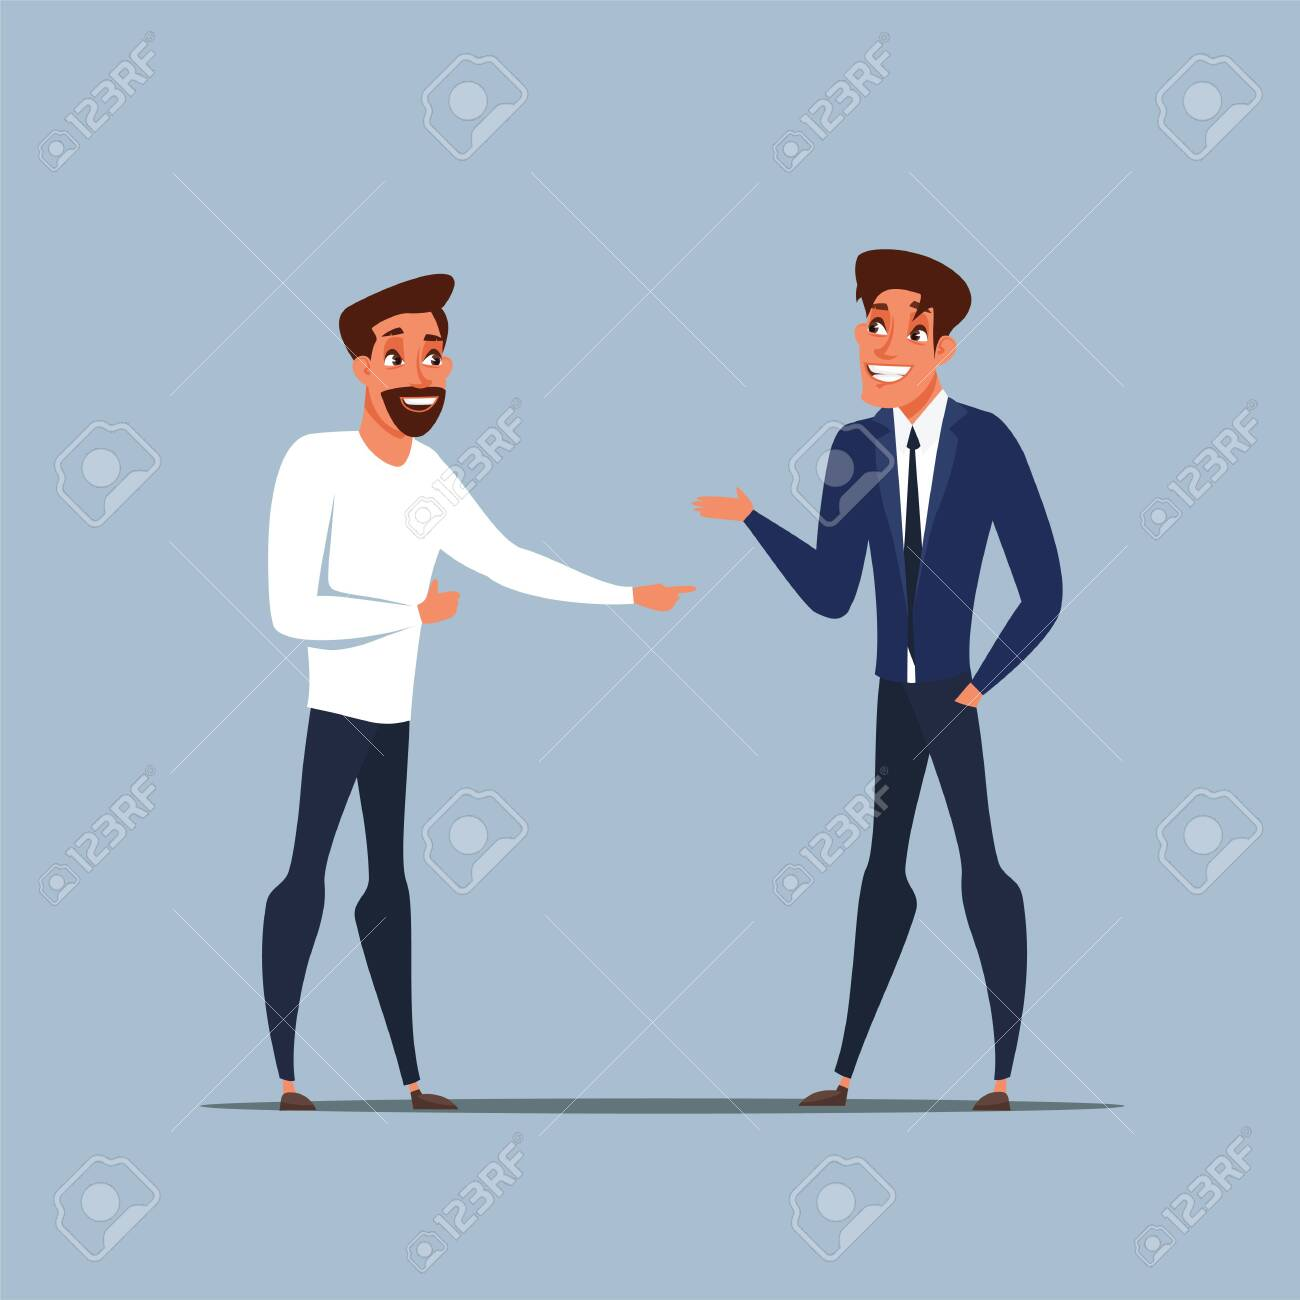 Business partners talking flat illustration - 130530335